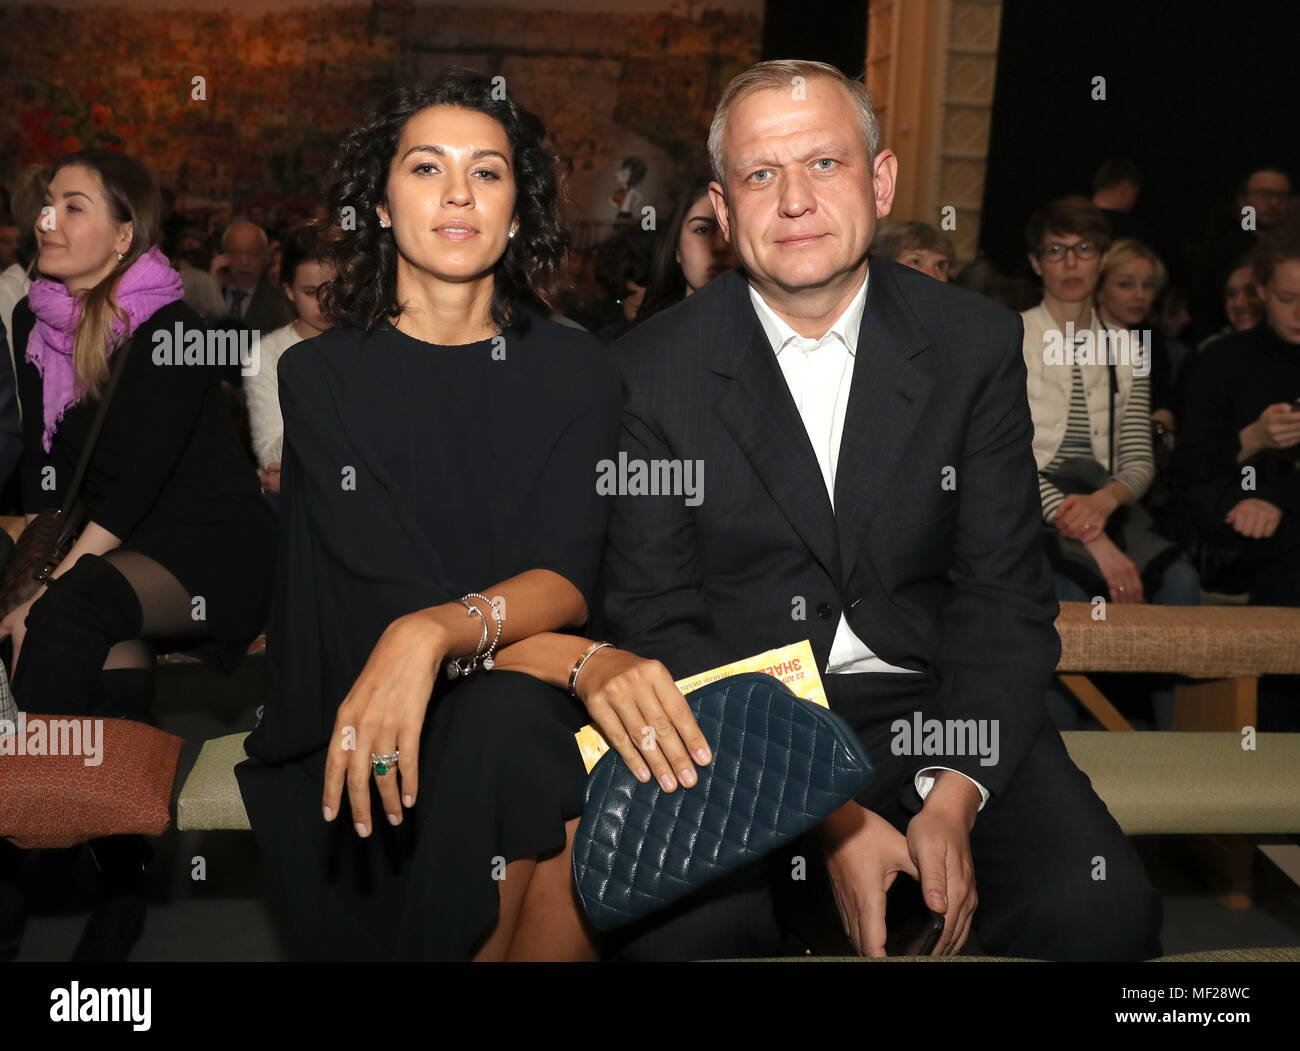 Dacha Vyacheslav Manucharova worth a small country 12.07.2012